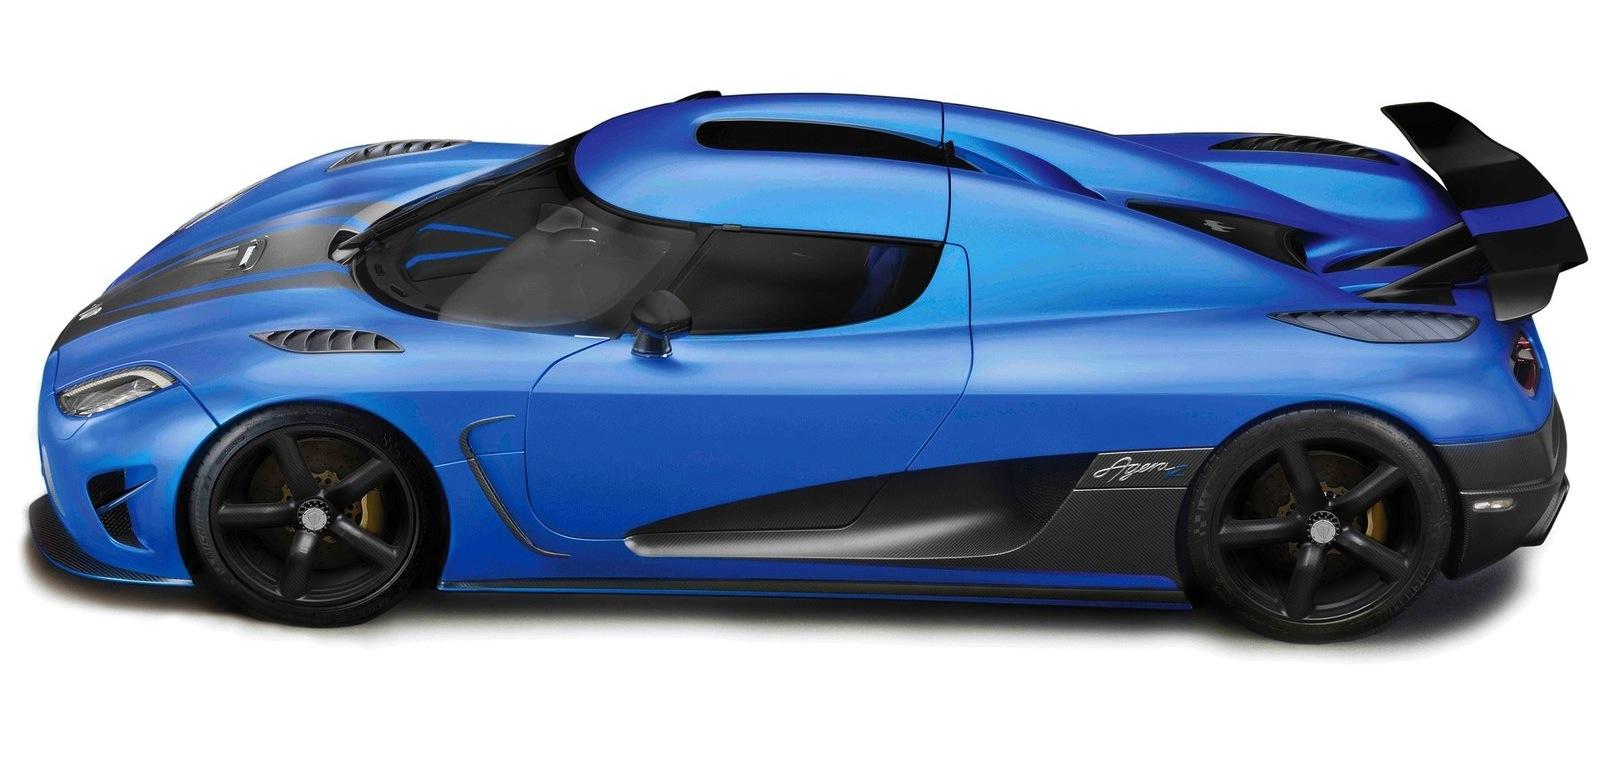 Koenigsegg One:1 has 450km/h top speed, 20sec 0-400km/h in its ...